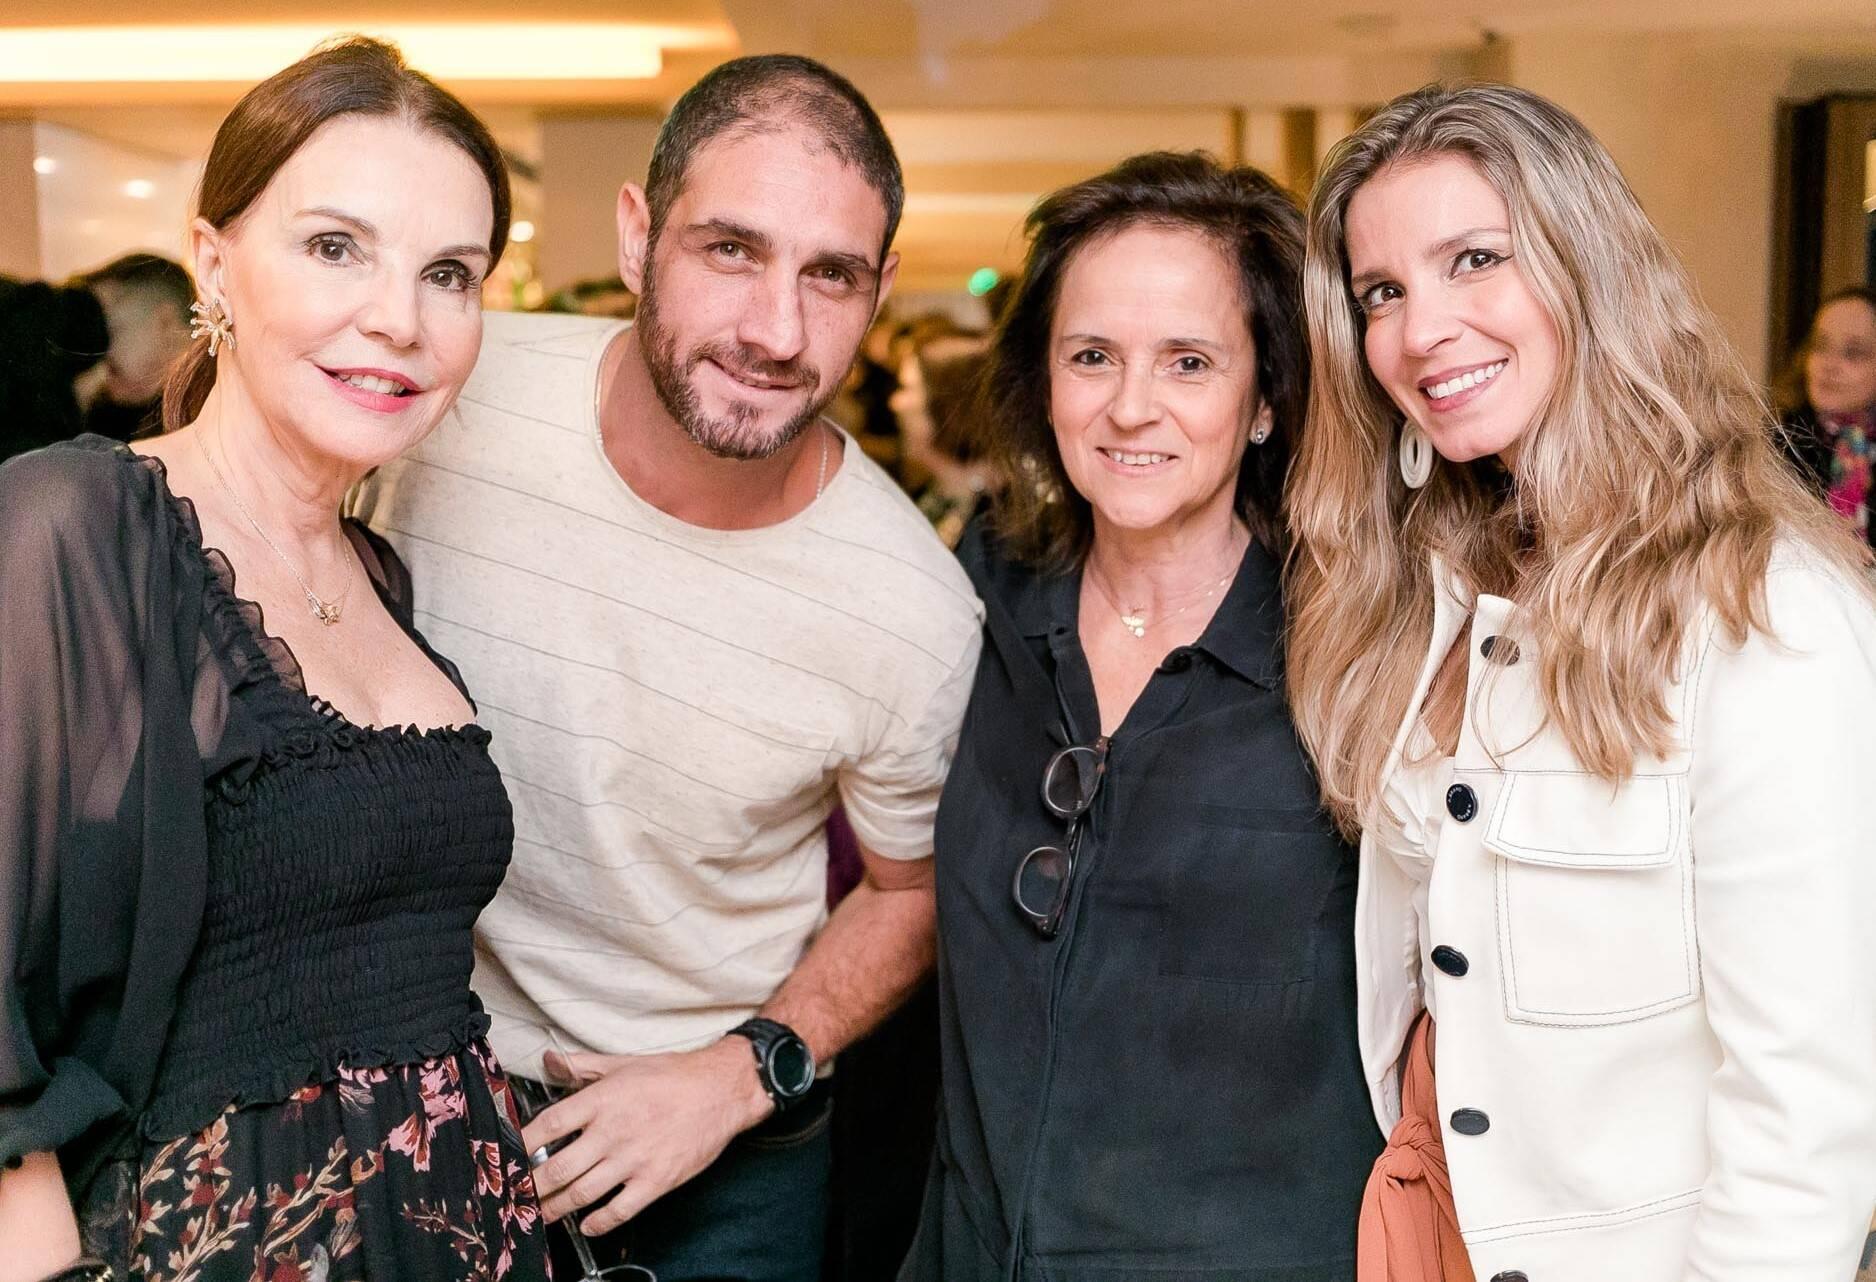 Patricia Mayer, Ari Kaye, Patricia Quentel e Aline Araujo /Foto: Miguel Sá